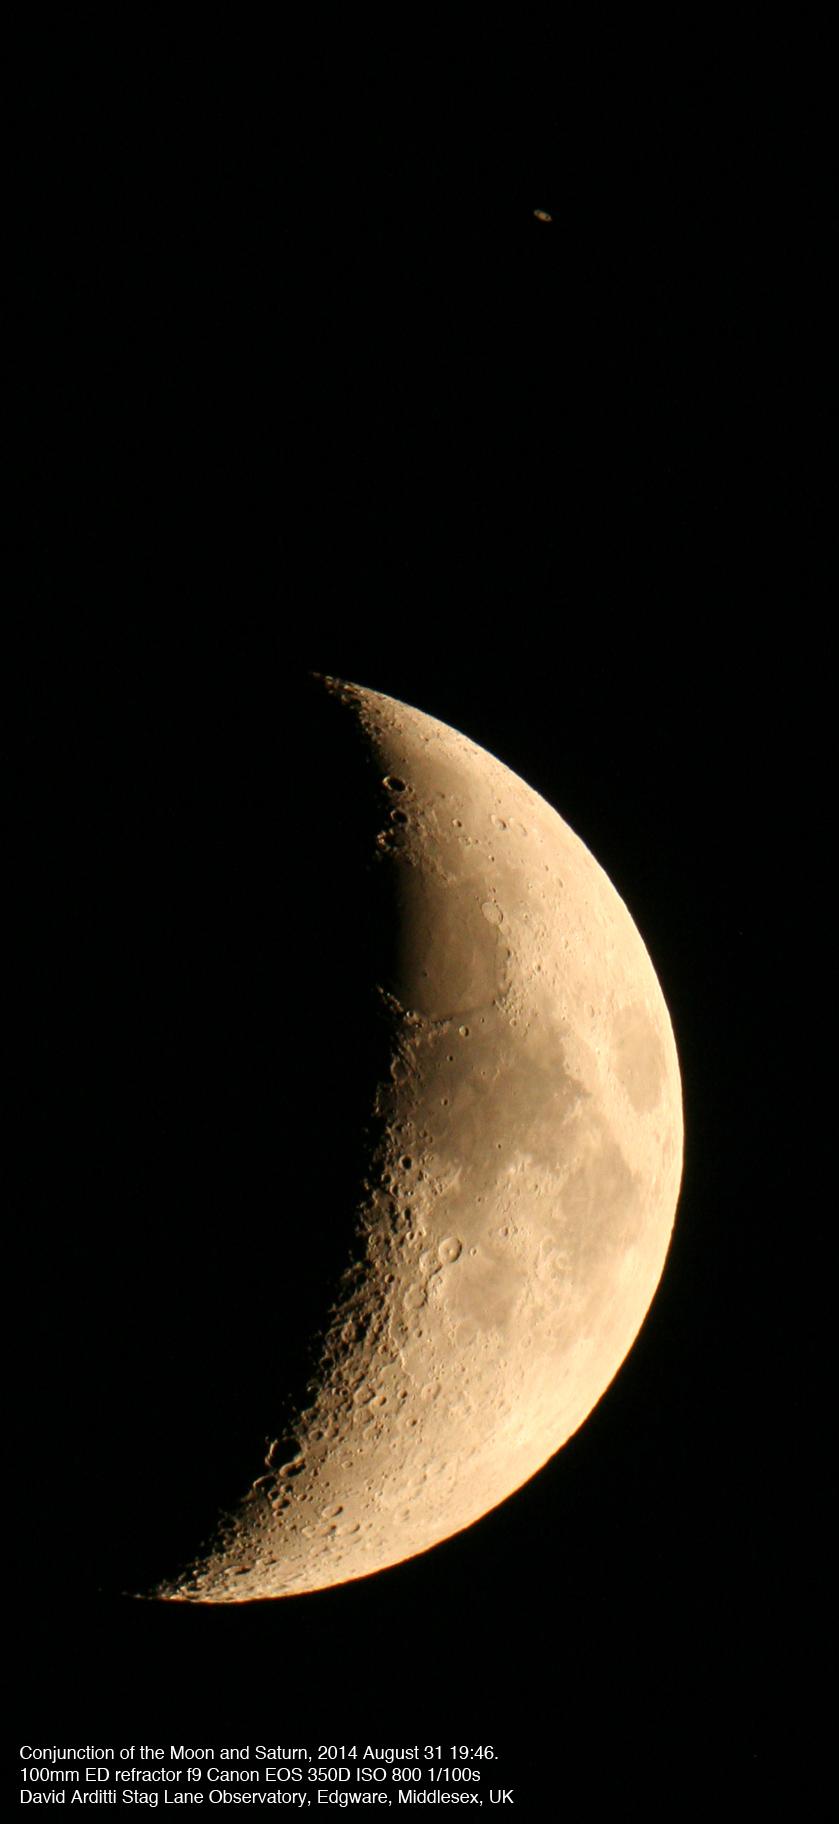 Moon-Sat2014-88-31-DLA